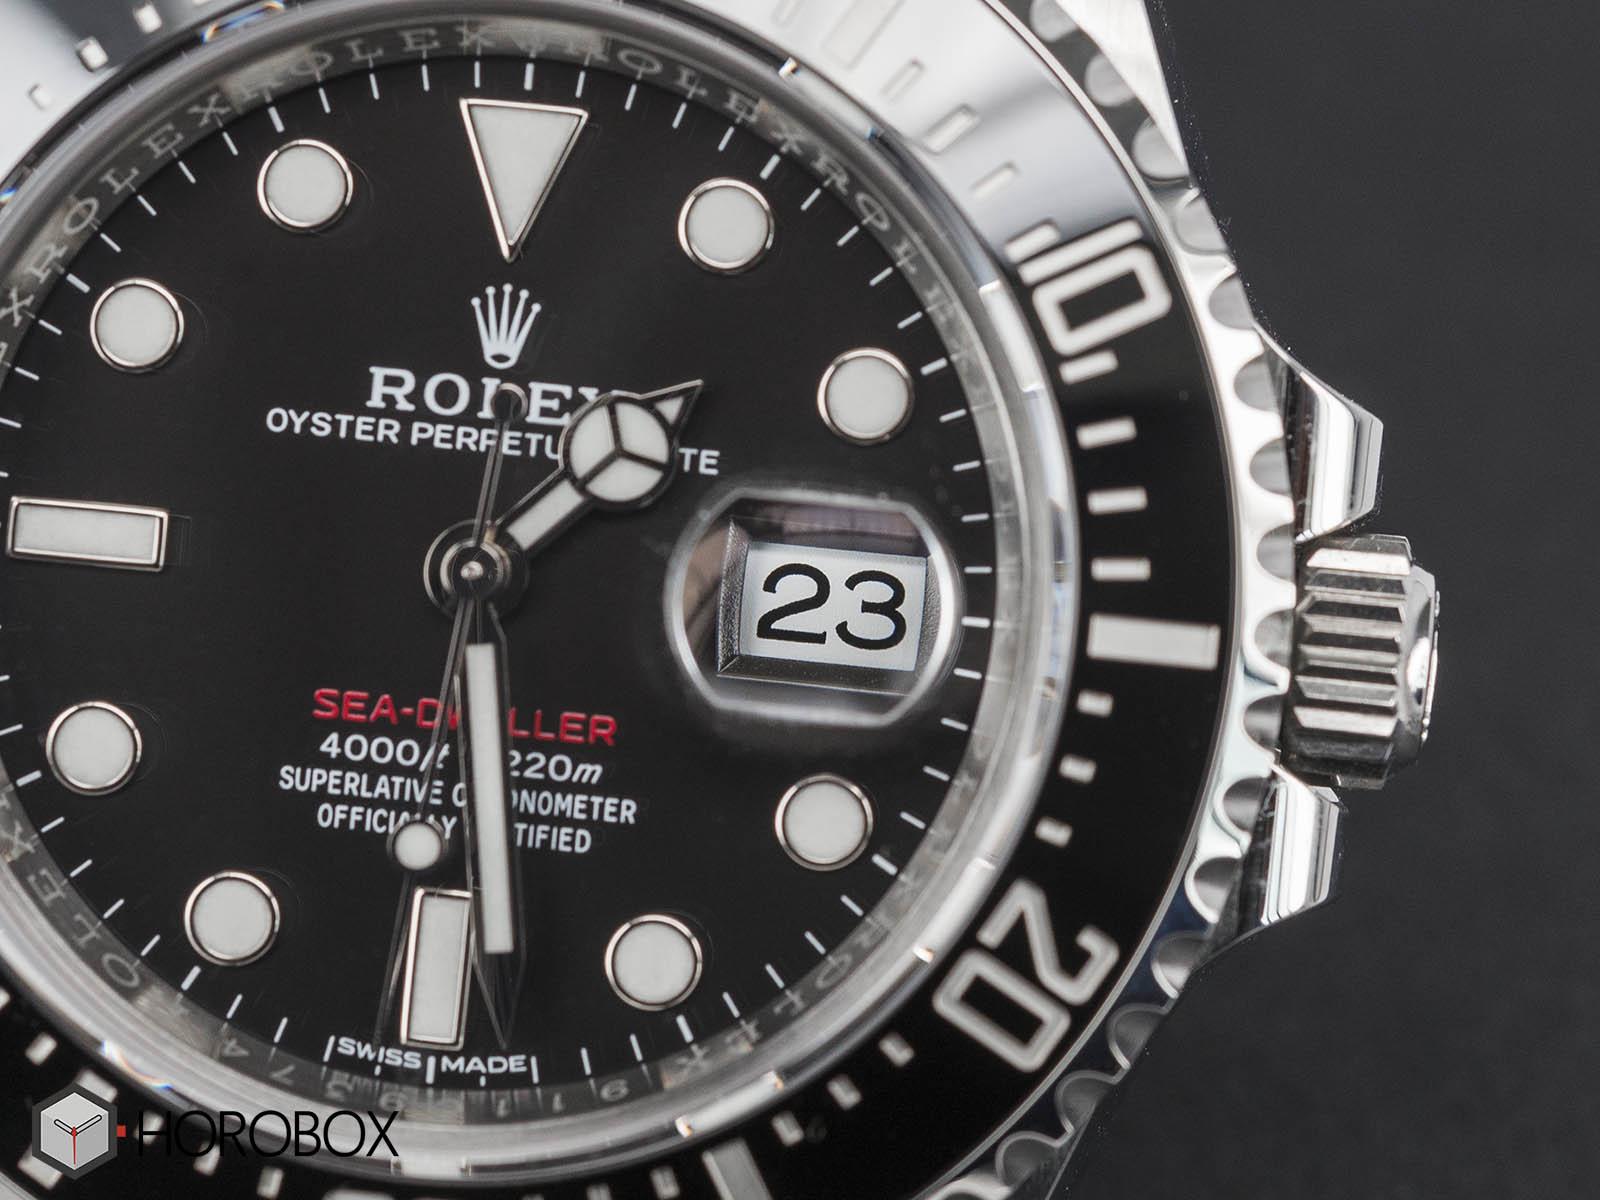 rolex-sea-dweller-50th-anniversary-126600-13.jpg